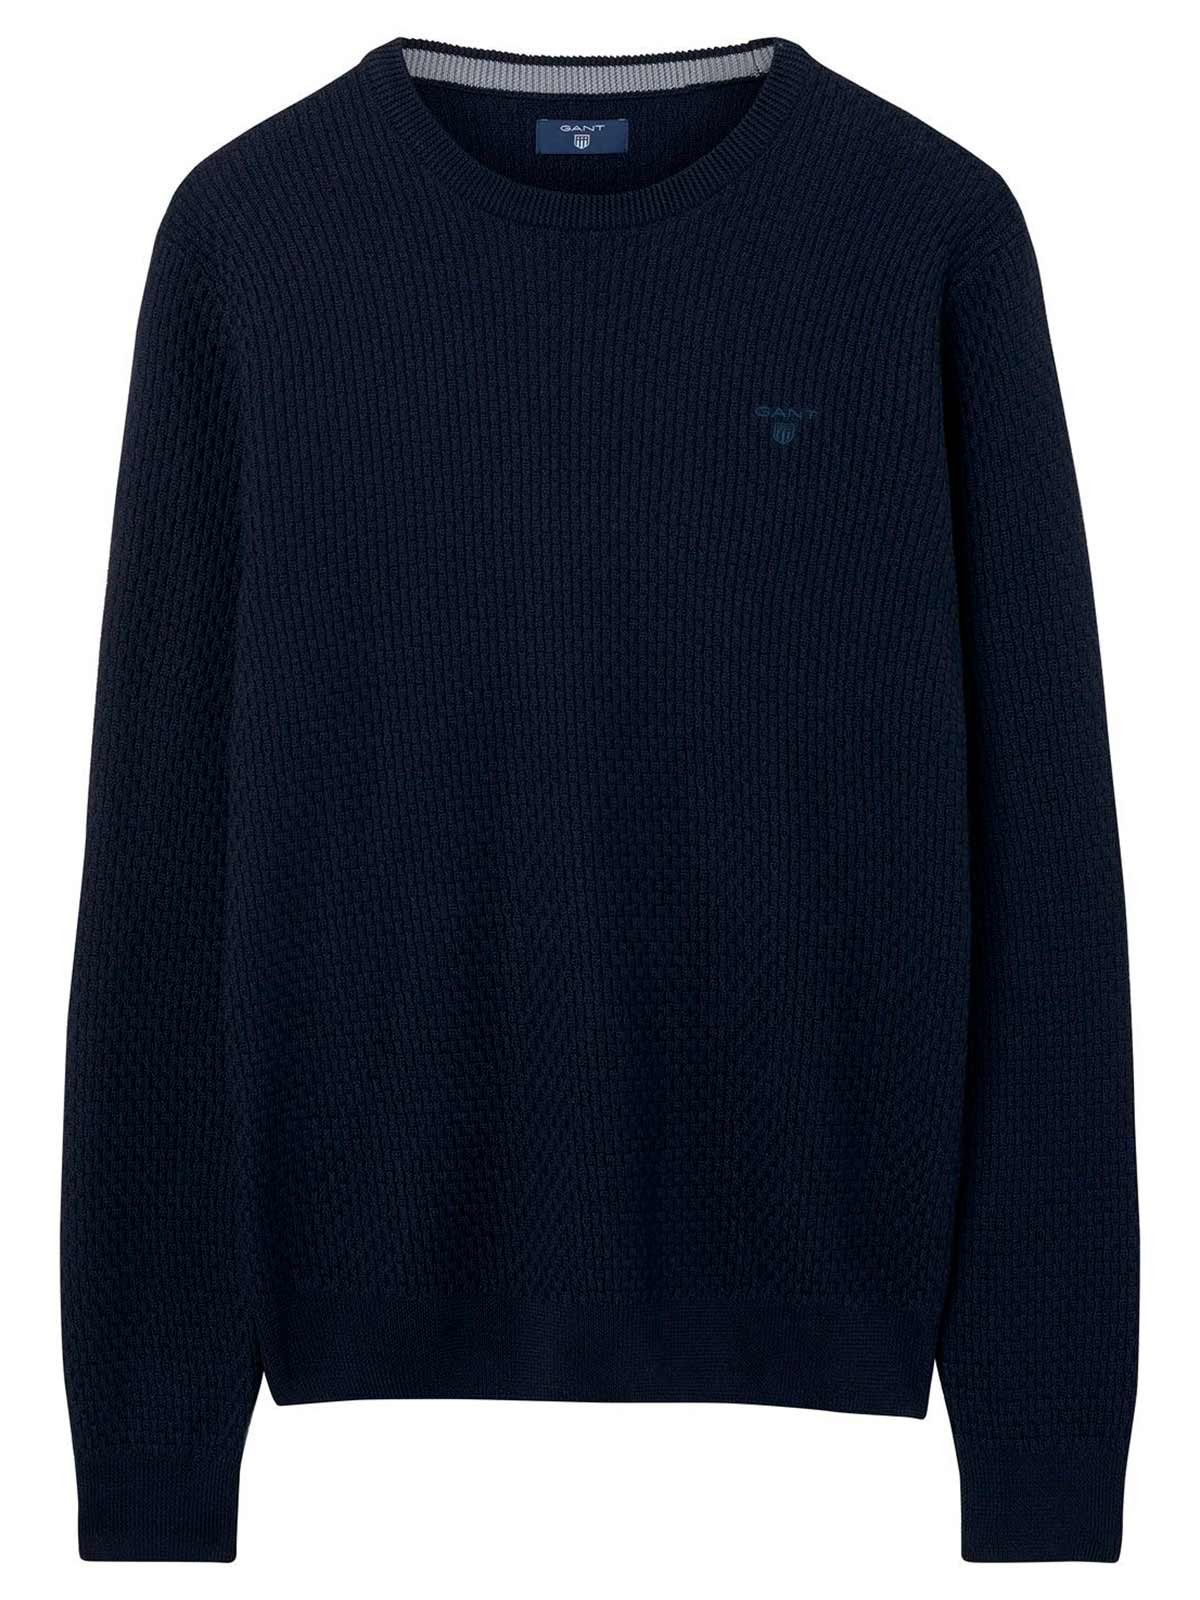 GANT Men's 18018030023433 Blue Cotton Sweatshirt